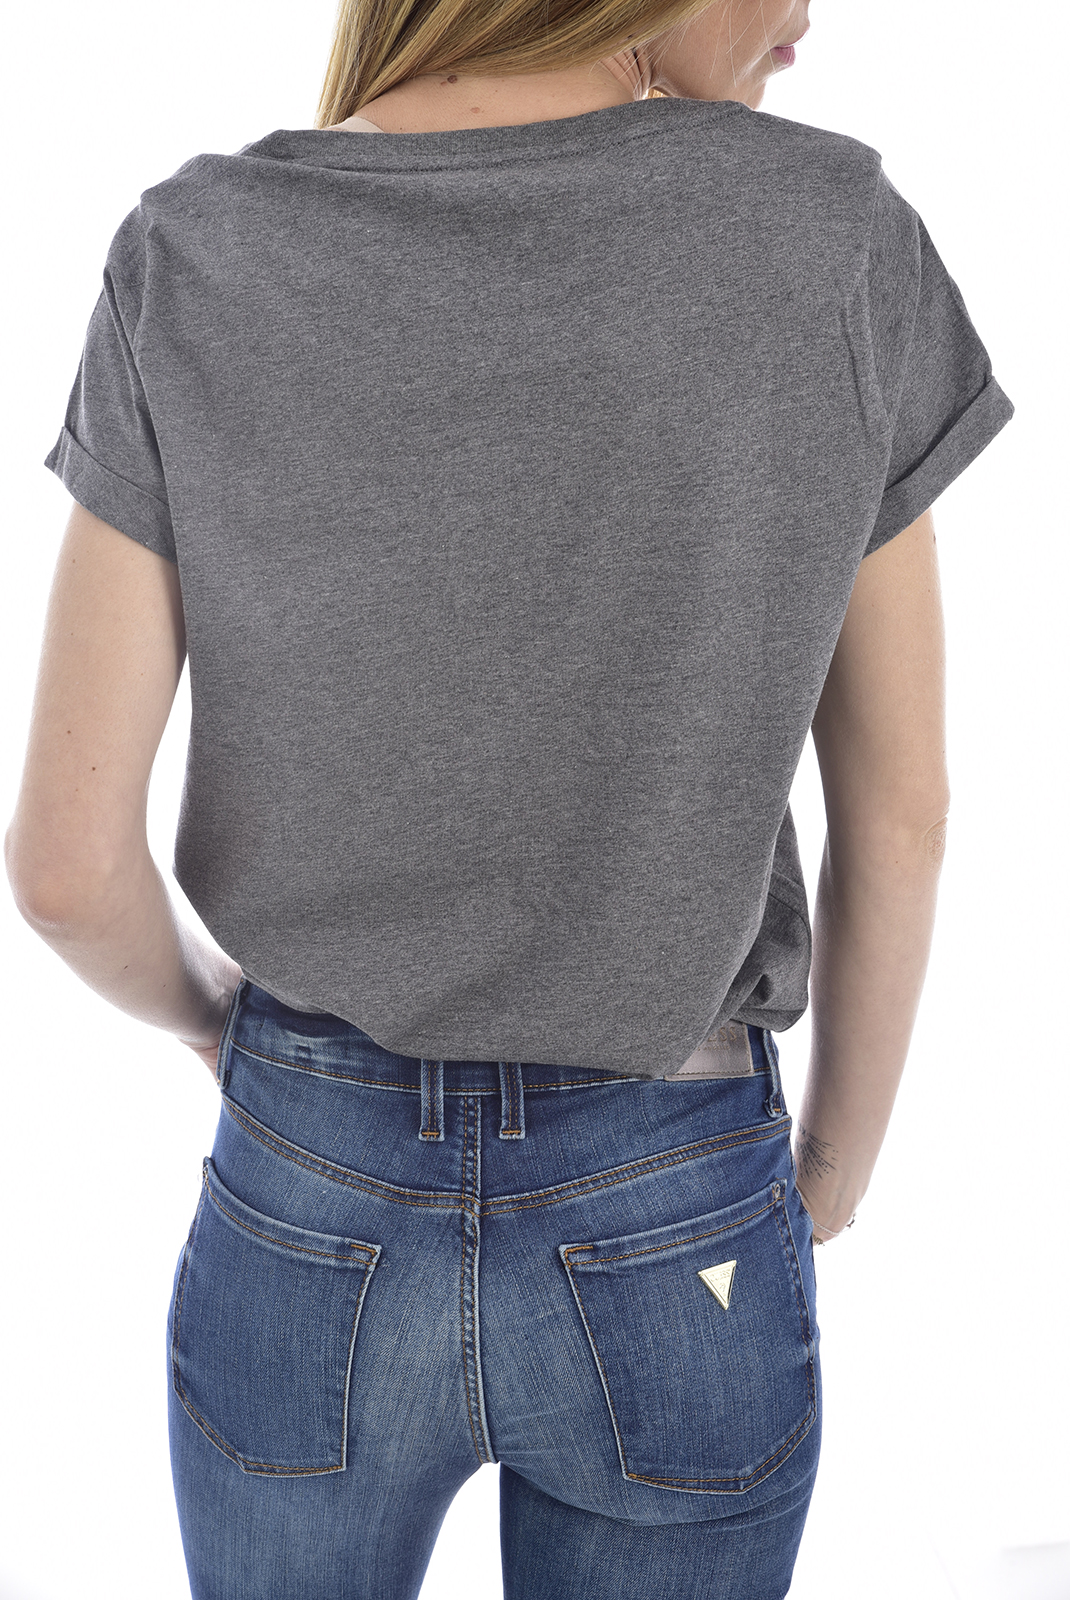 Tee shirt  Tommy Jeans UW01618 091 DARK GREY HTR